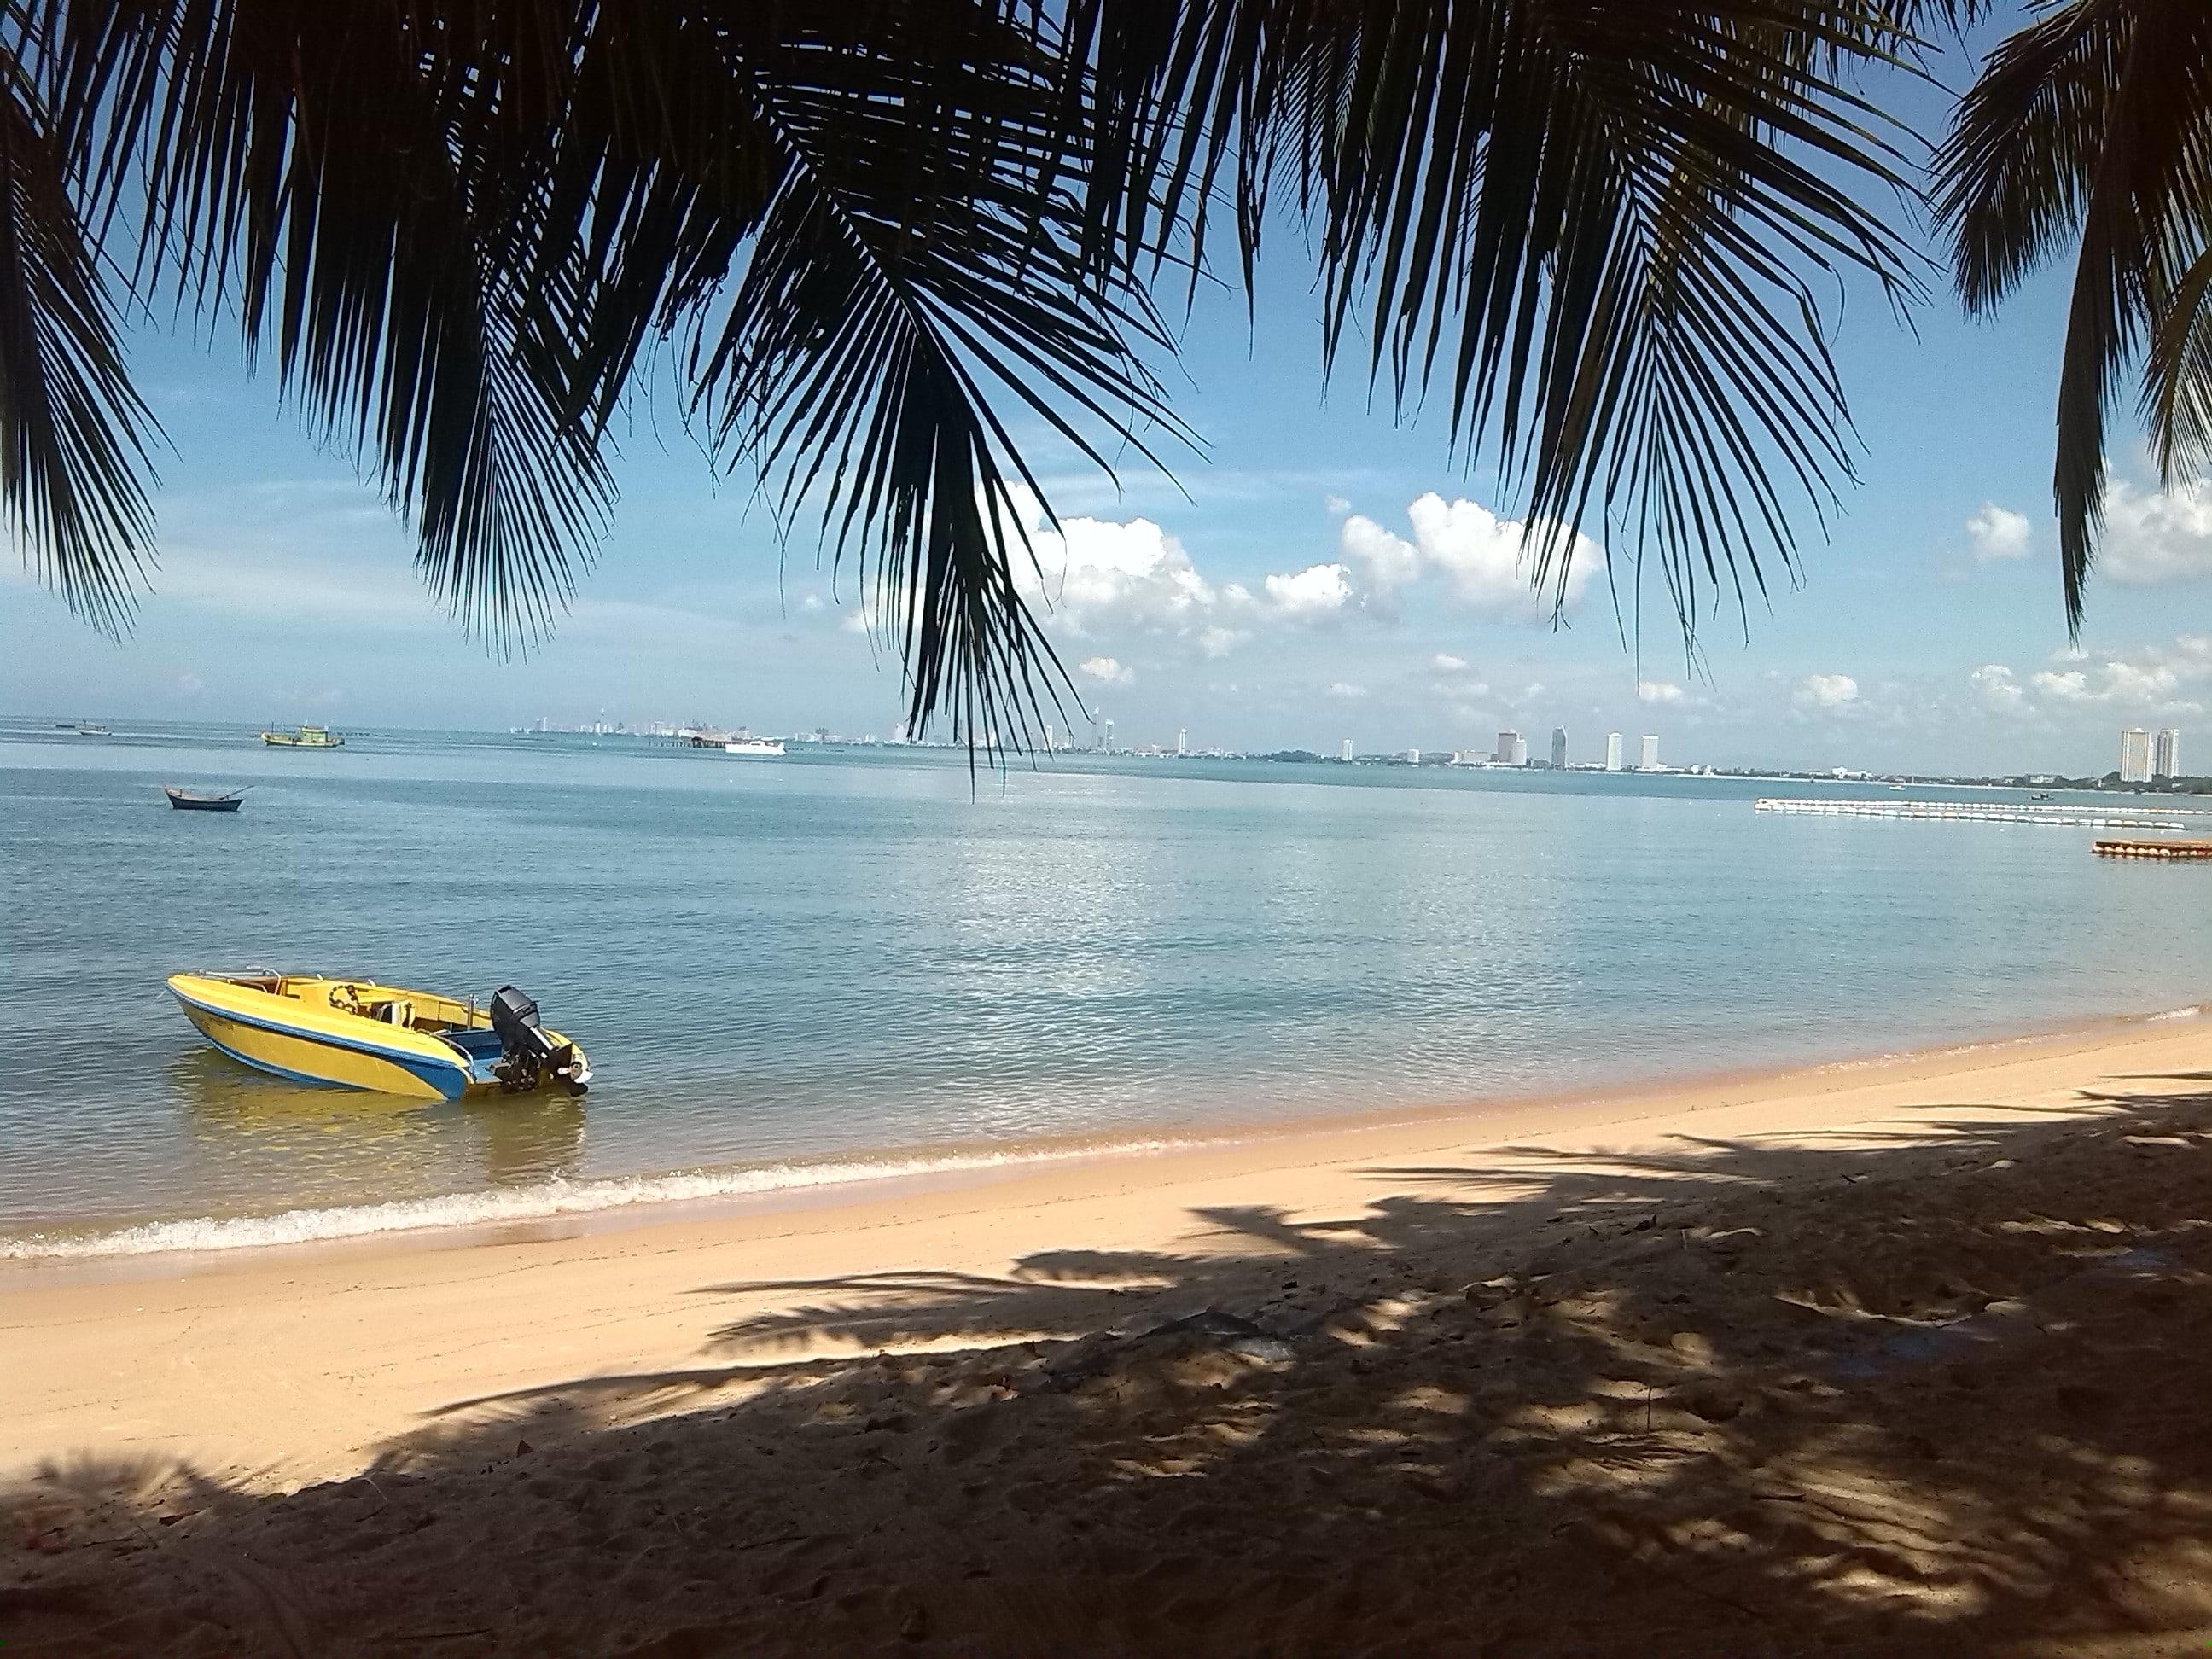 bang saray beach chonb - HD2592×1944